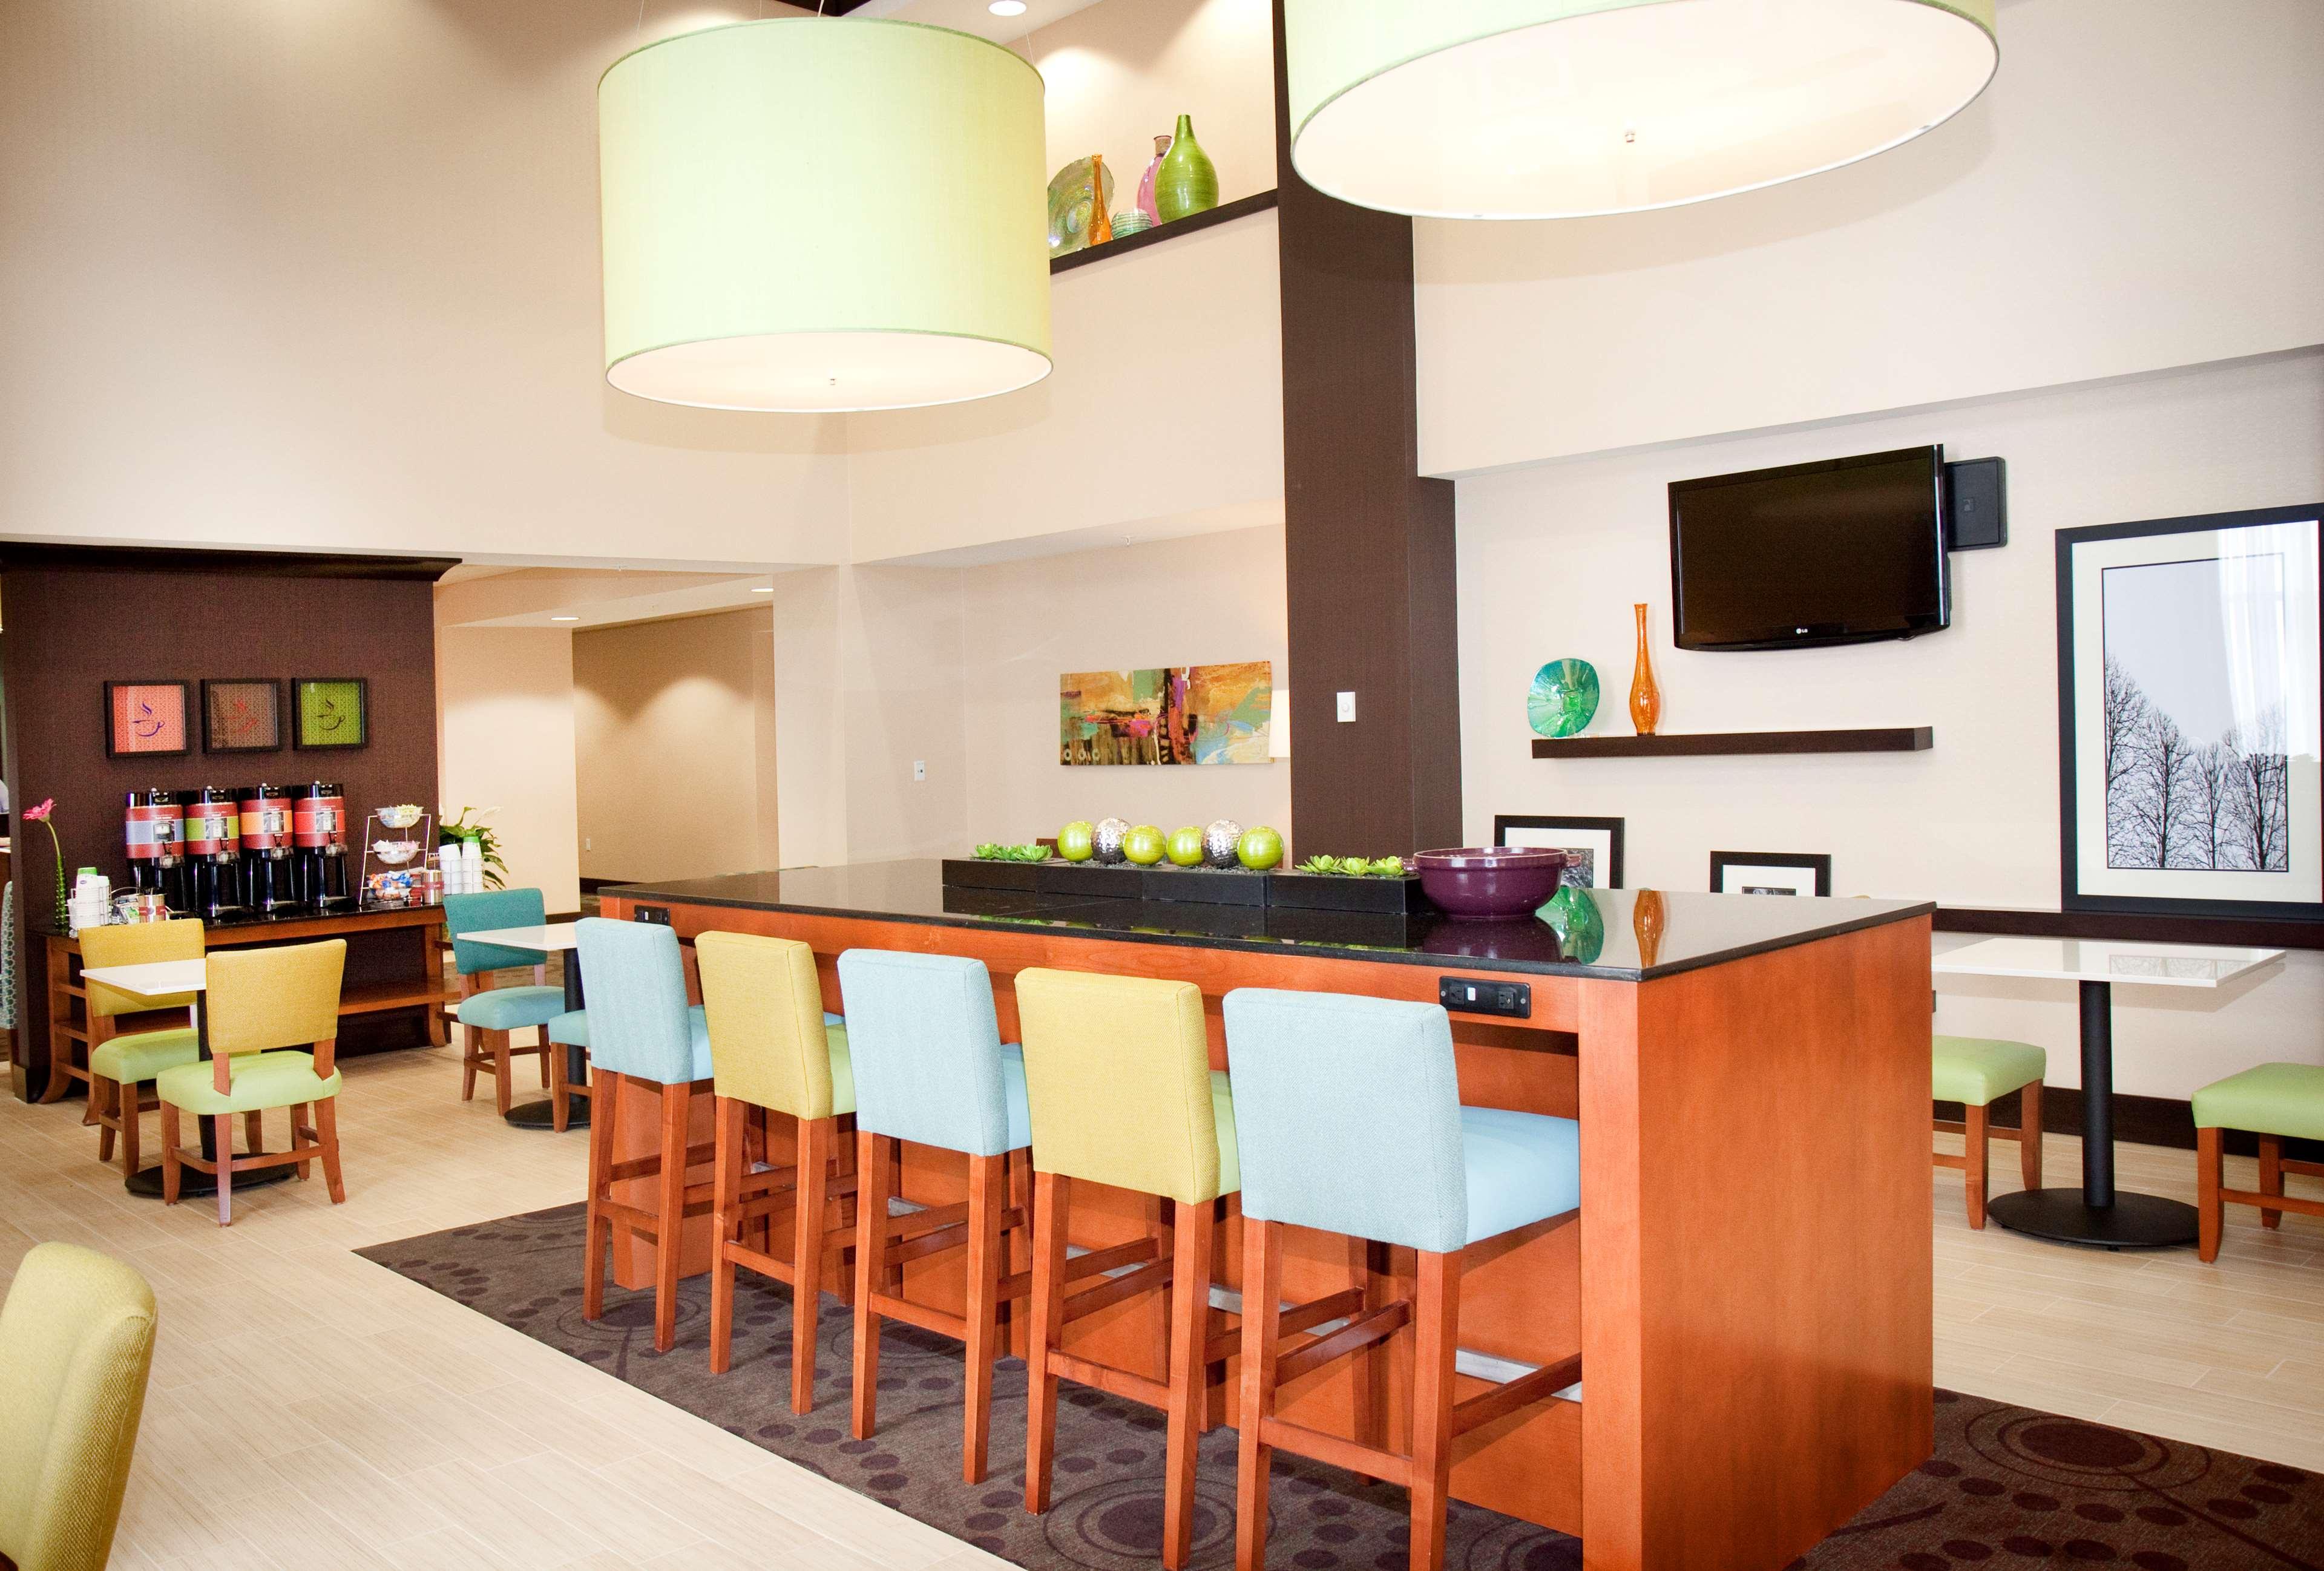 Hampton Inn & Suites Wheeling-The Highlands image 4